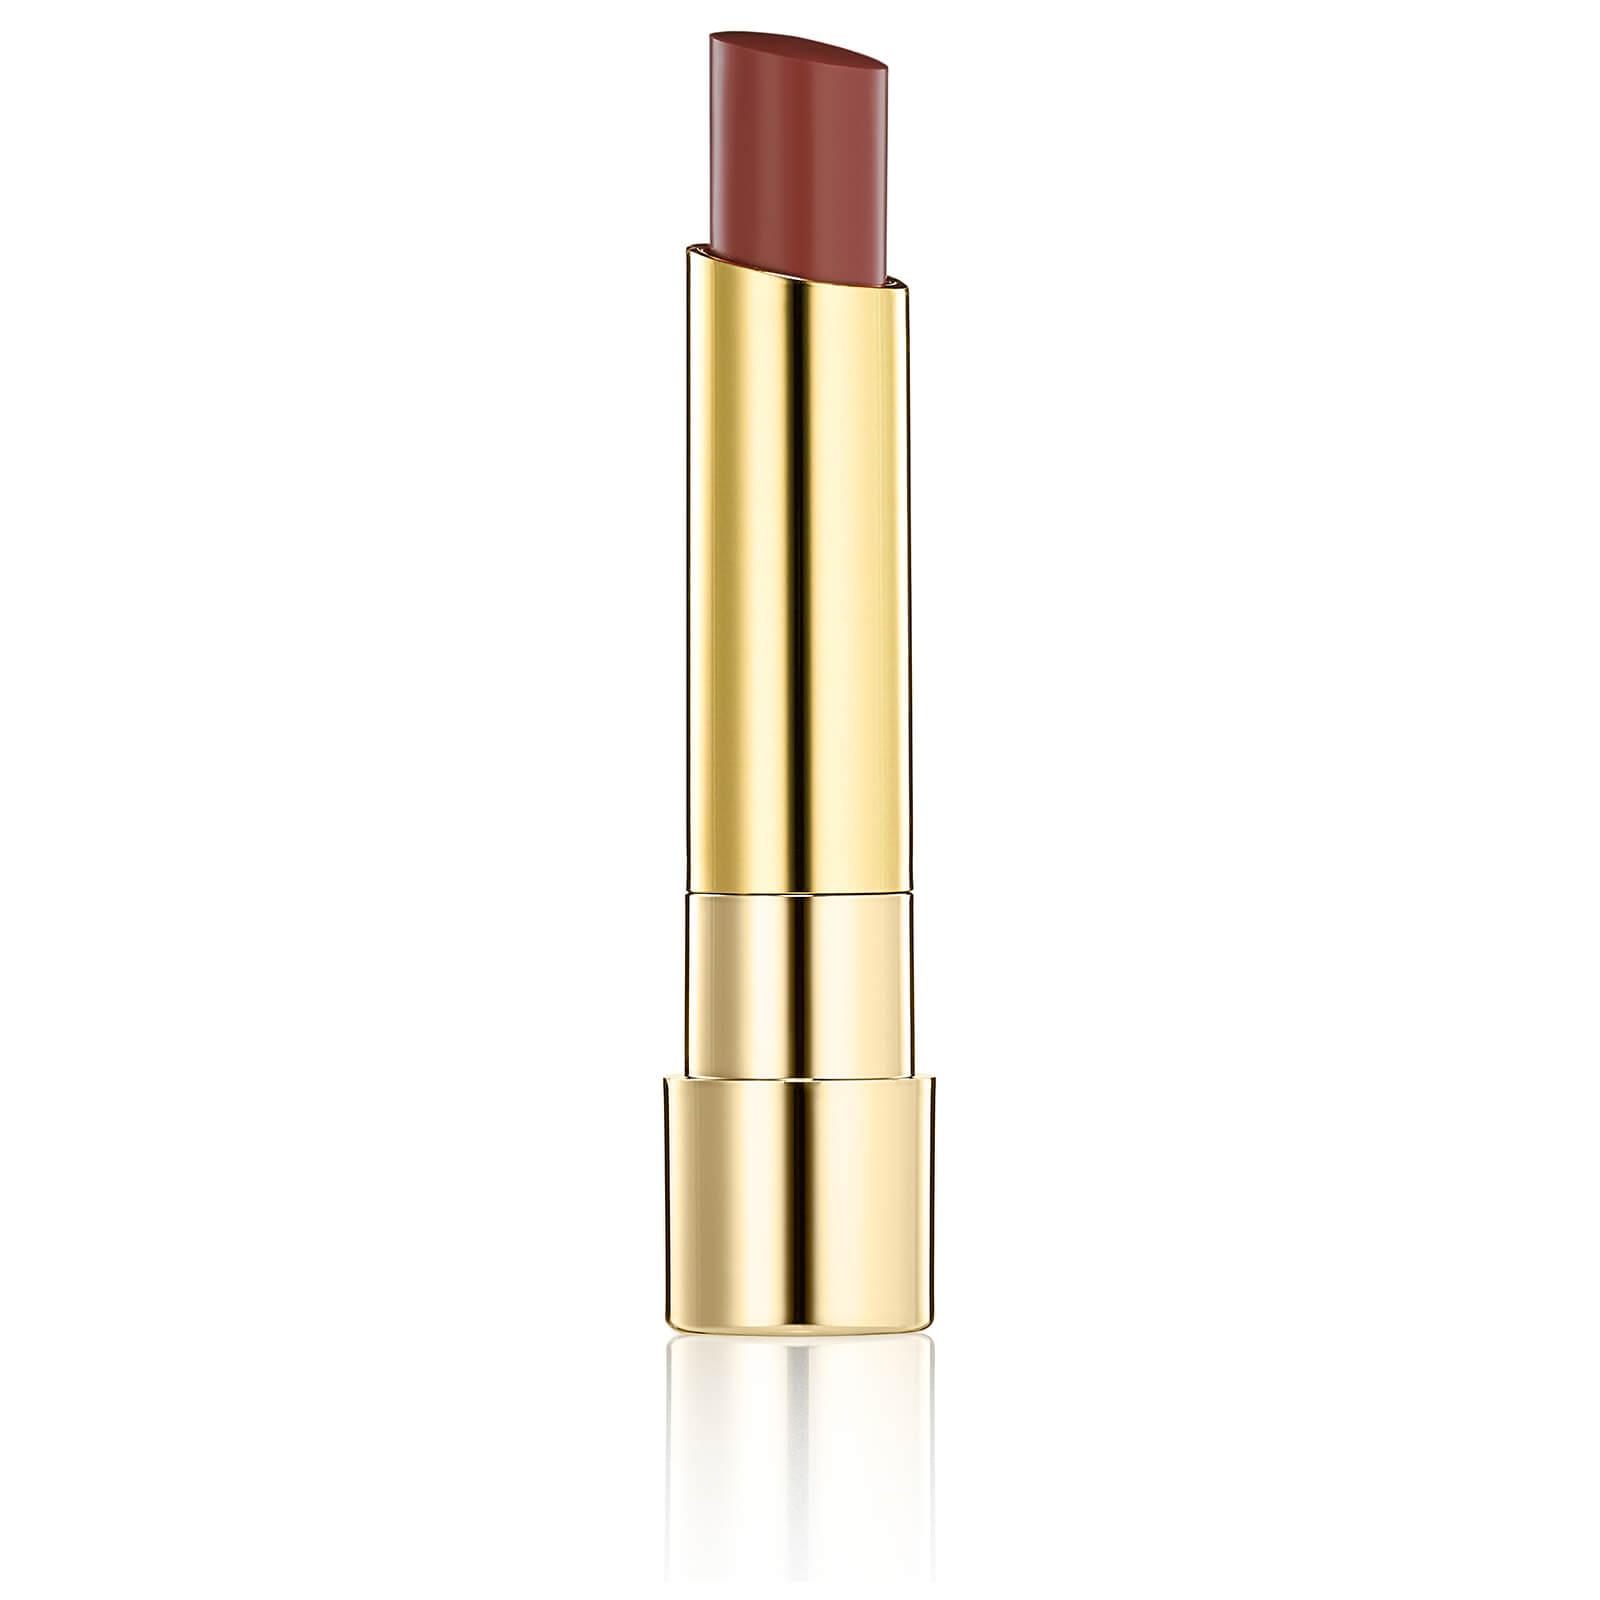 Купить Stila Color Balm Lipstick 3g (Various Shades) - Vivienne